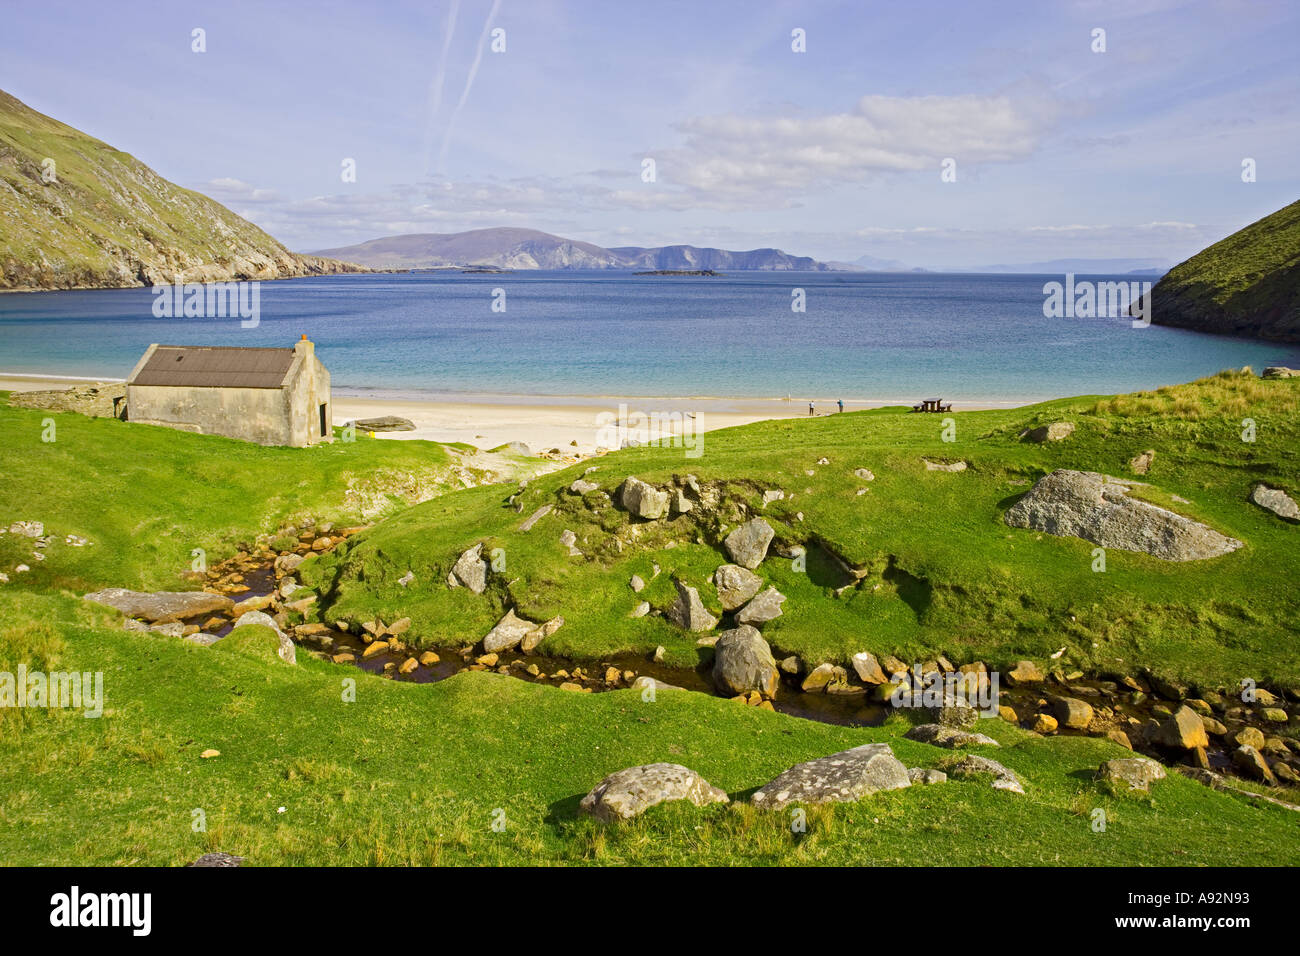 Keel Beach Achill Island Co Mayo Eire - Stock Image